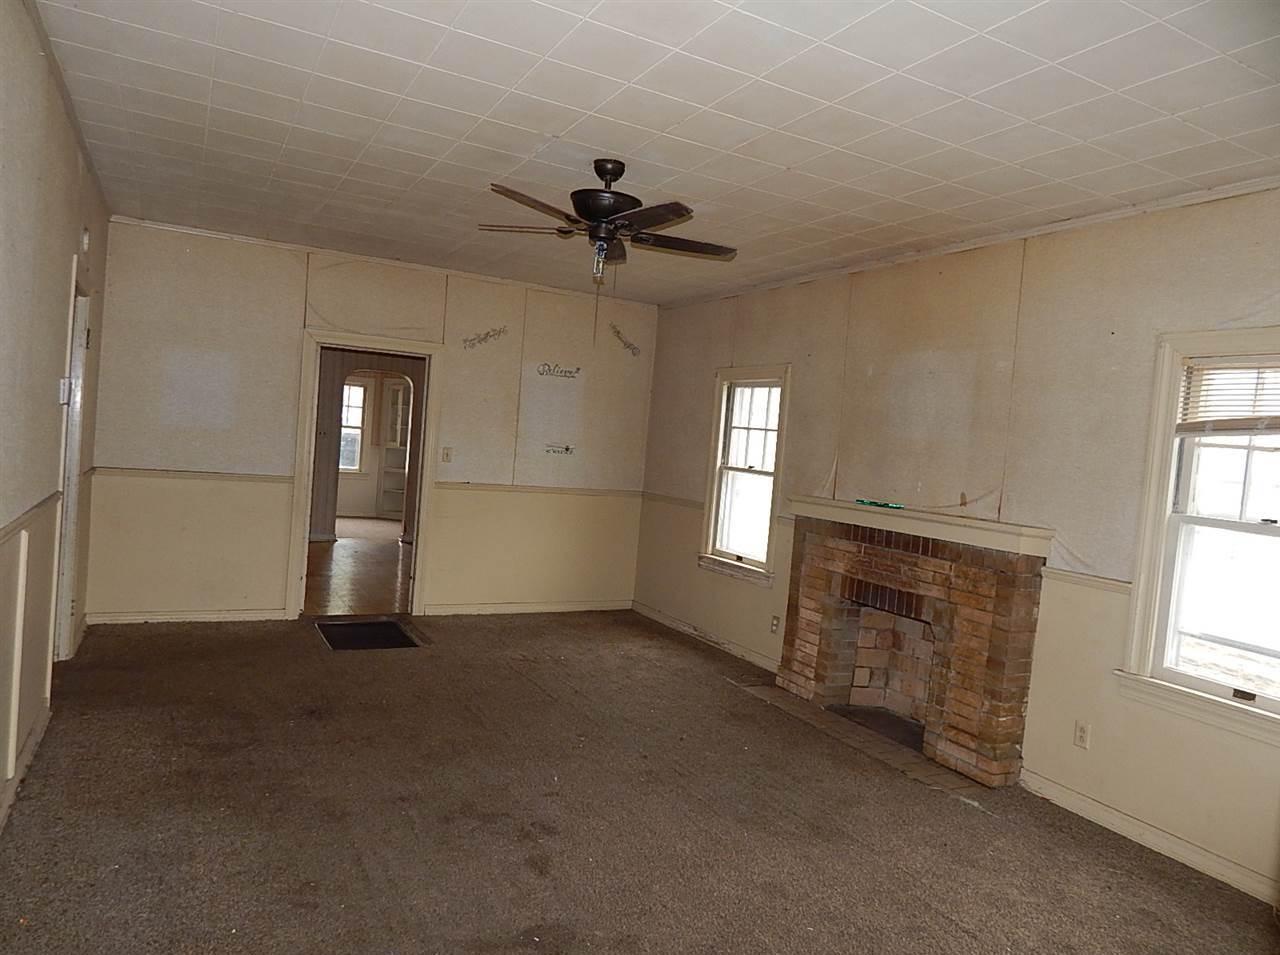 Sold Cross Sale W/ MLS | 414 N Palm Ponca City, OK 74601 1